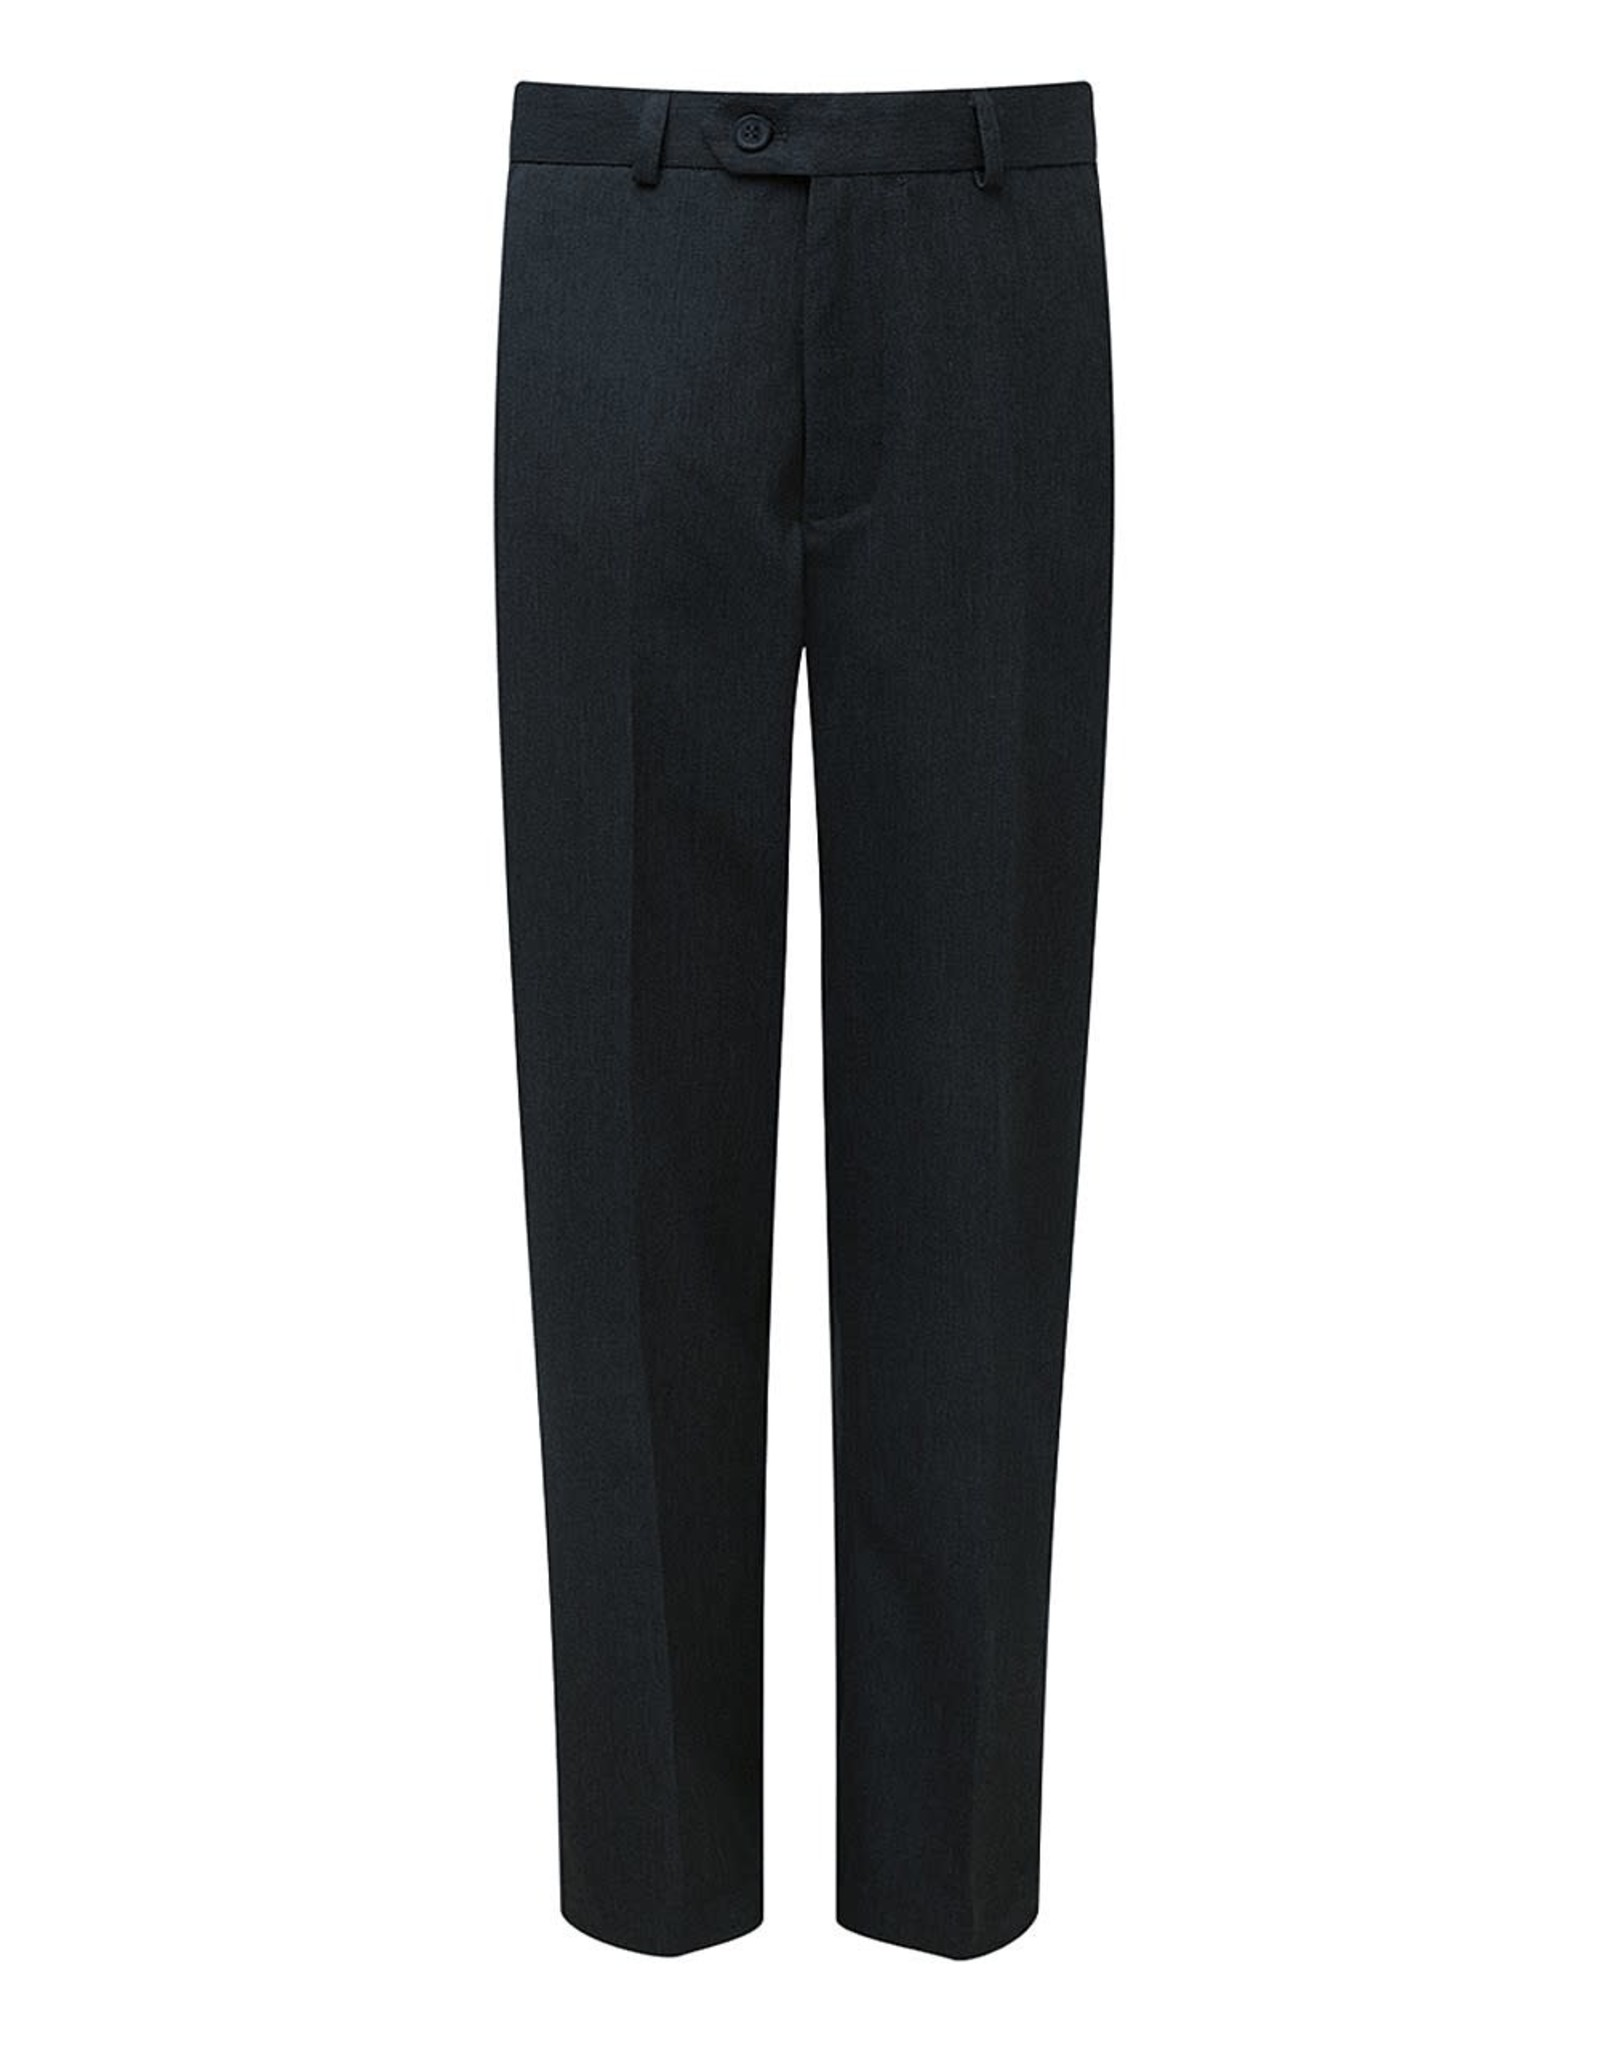 Boys Aspire Flat Front Trousers - Child Size-Nicholas Chamberlaine School